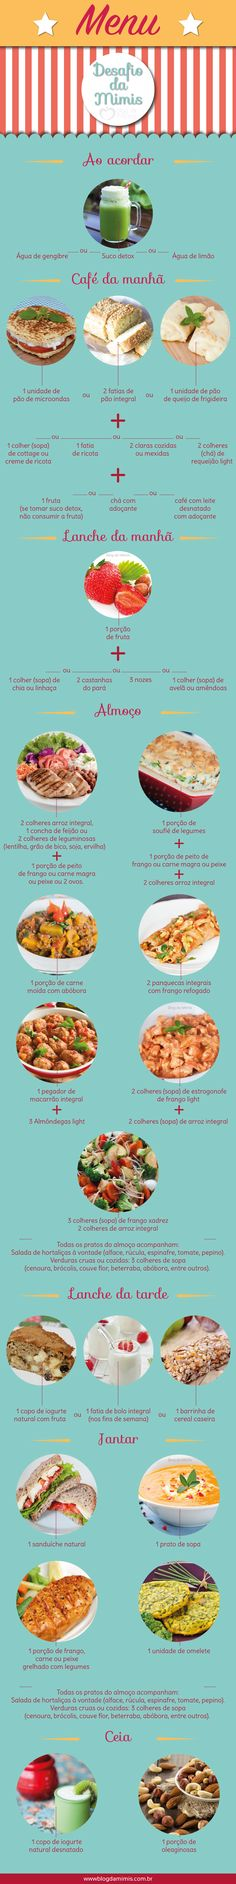 Cardápio simples para iniciar a reeducação alimentar [ mimi's menu in http://blogdamimis.com.br/ ]